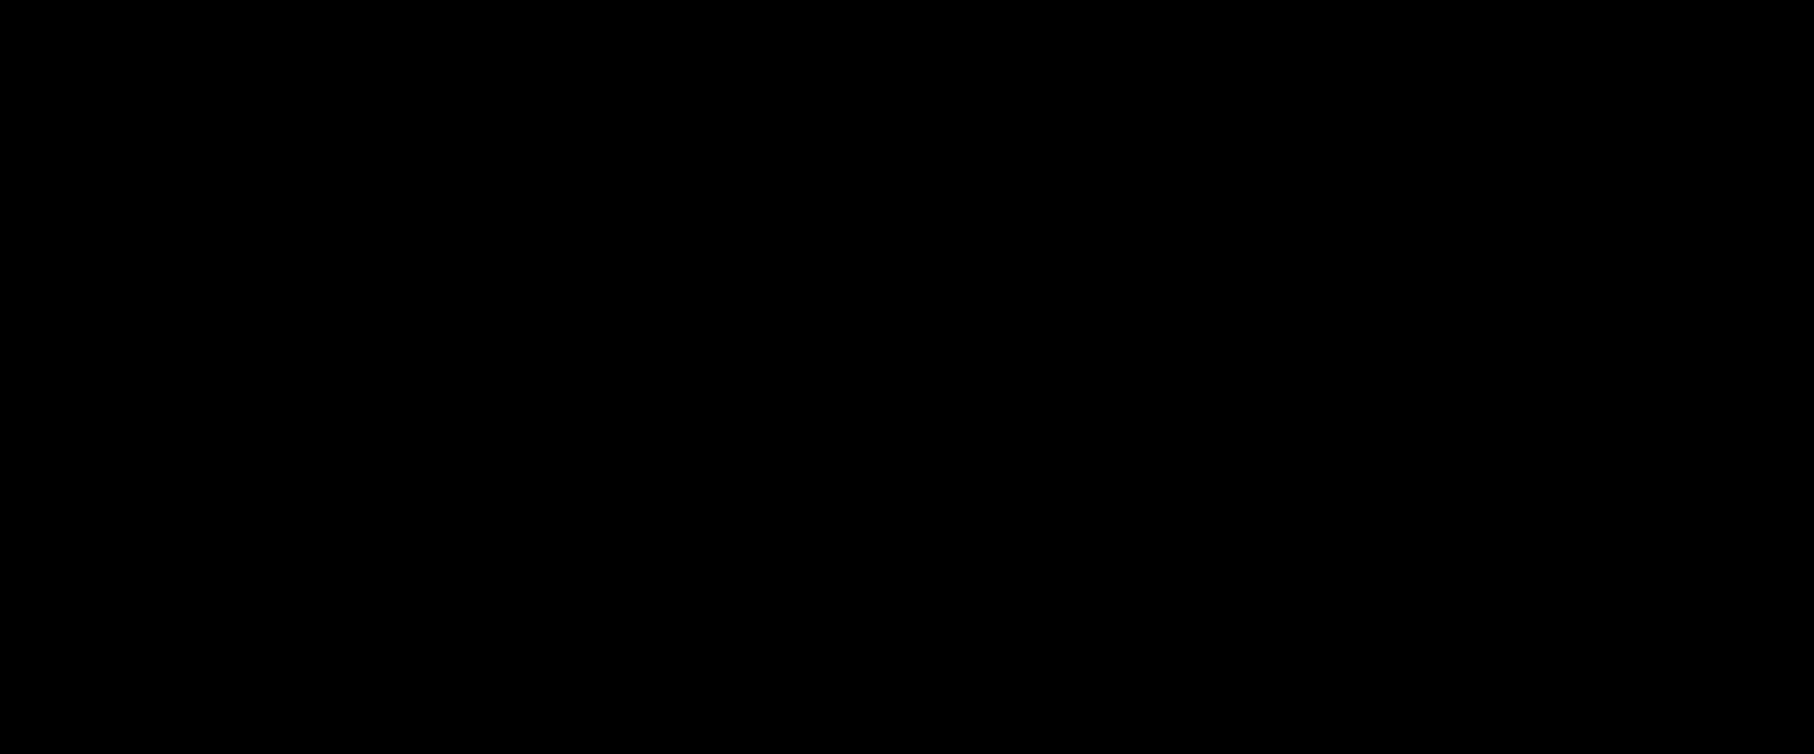 GR KOUBAS - ΕΤΑΙΡΕΙΑ ΔΙΑΧΕΙΡΙΣΗΣ ΚΑΙ ΕΜΠΟΡΙΟΥ ΑΕ